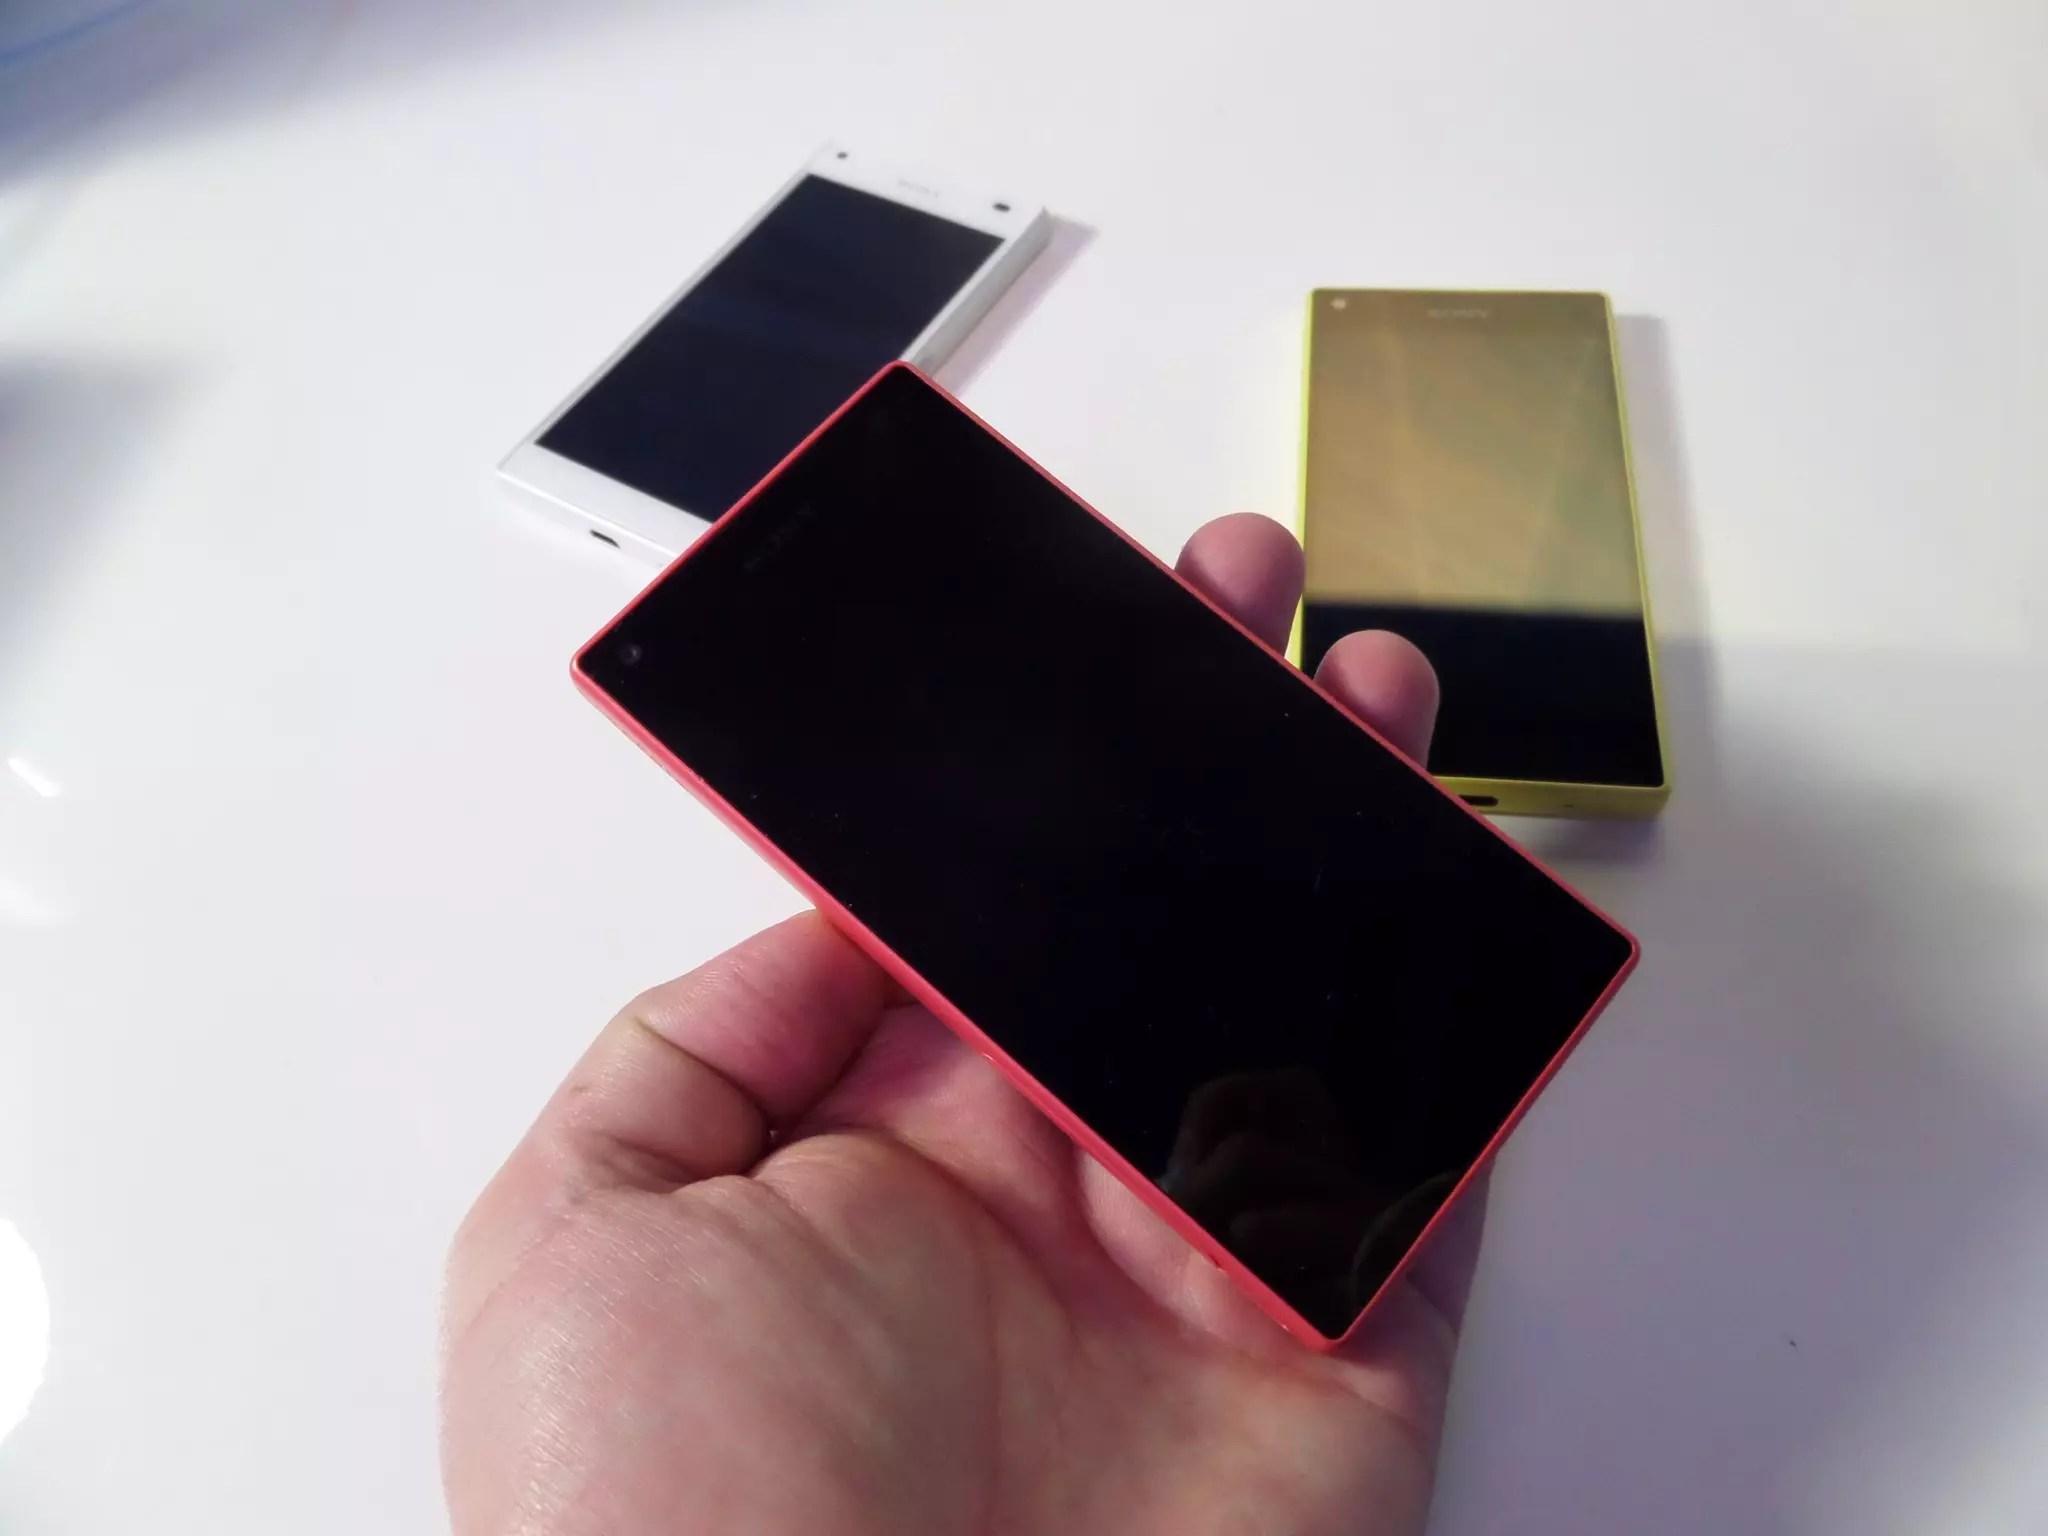 Sony Xperia Z5 Compact colores mano